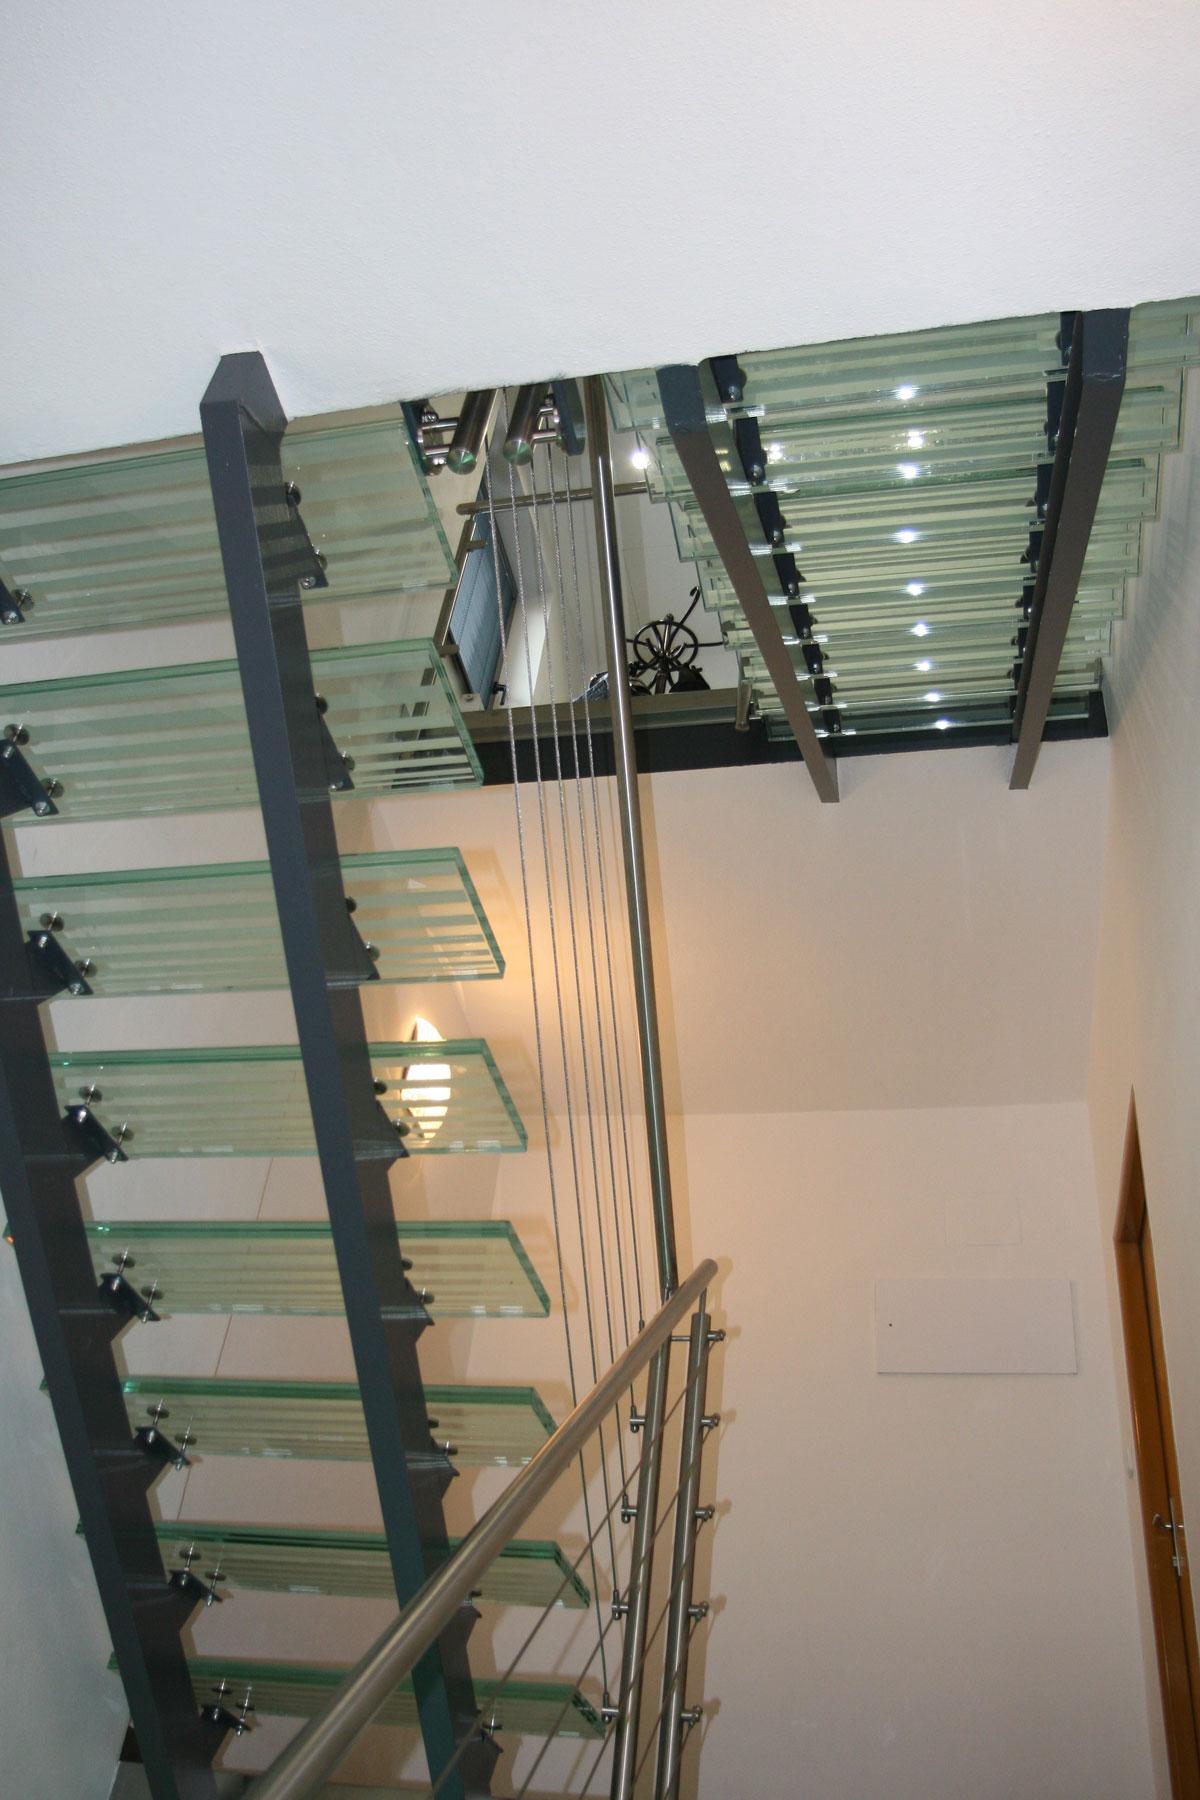 Sklenarstvi-Prerost-schody-a- pochozi-sklo (20)